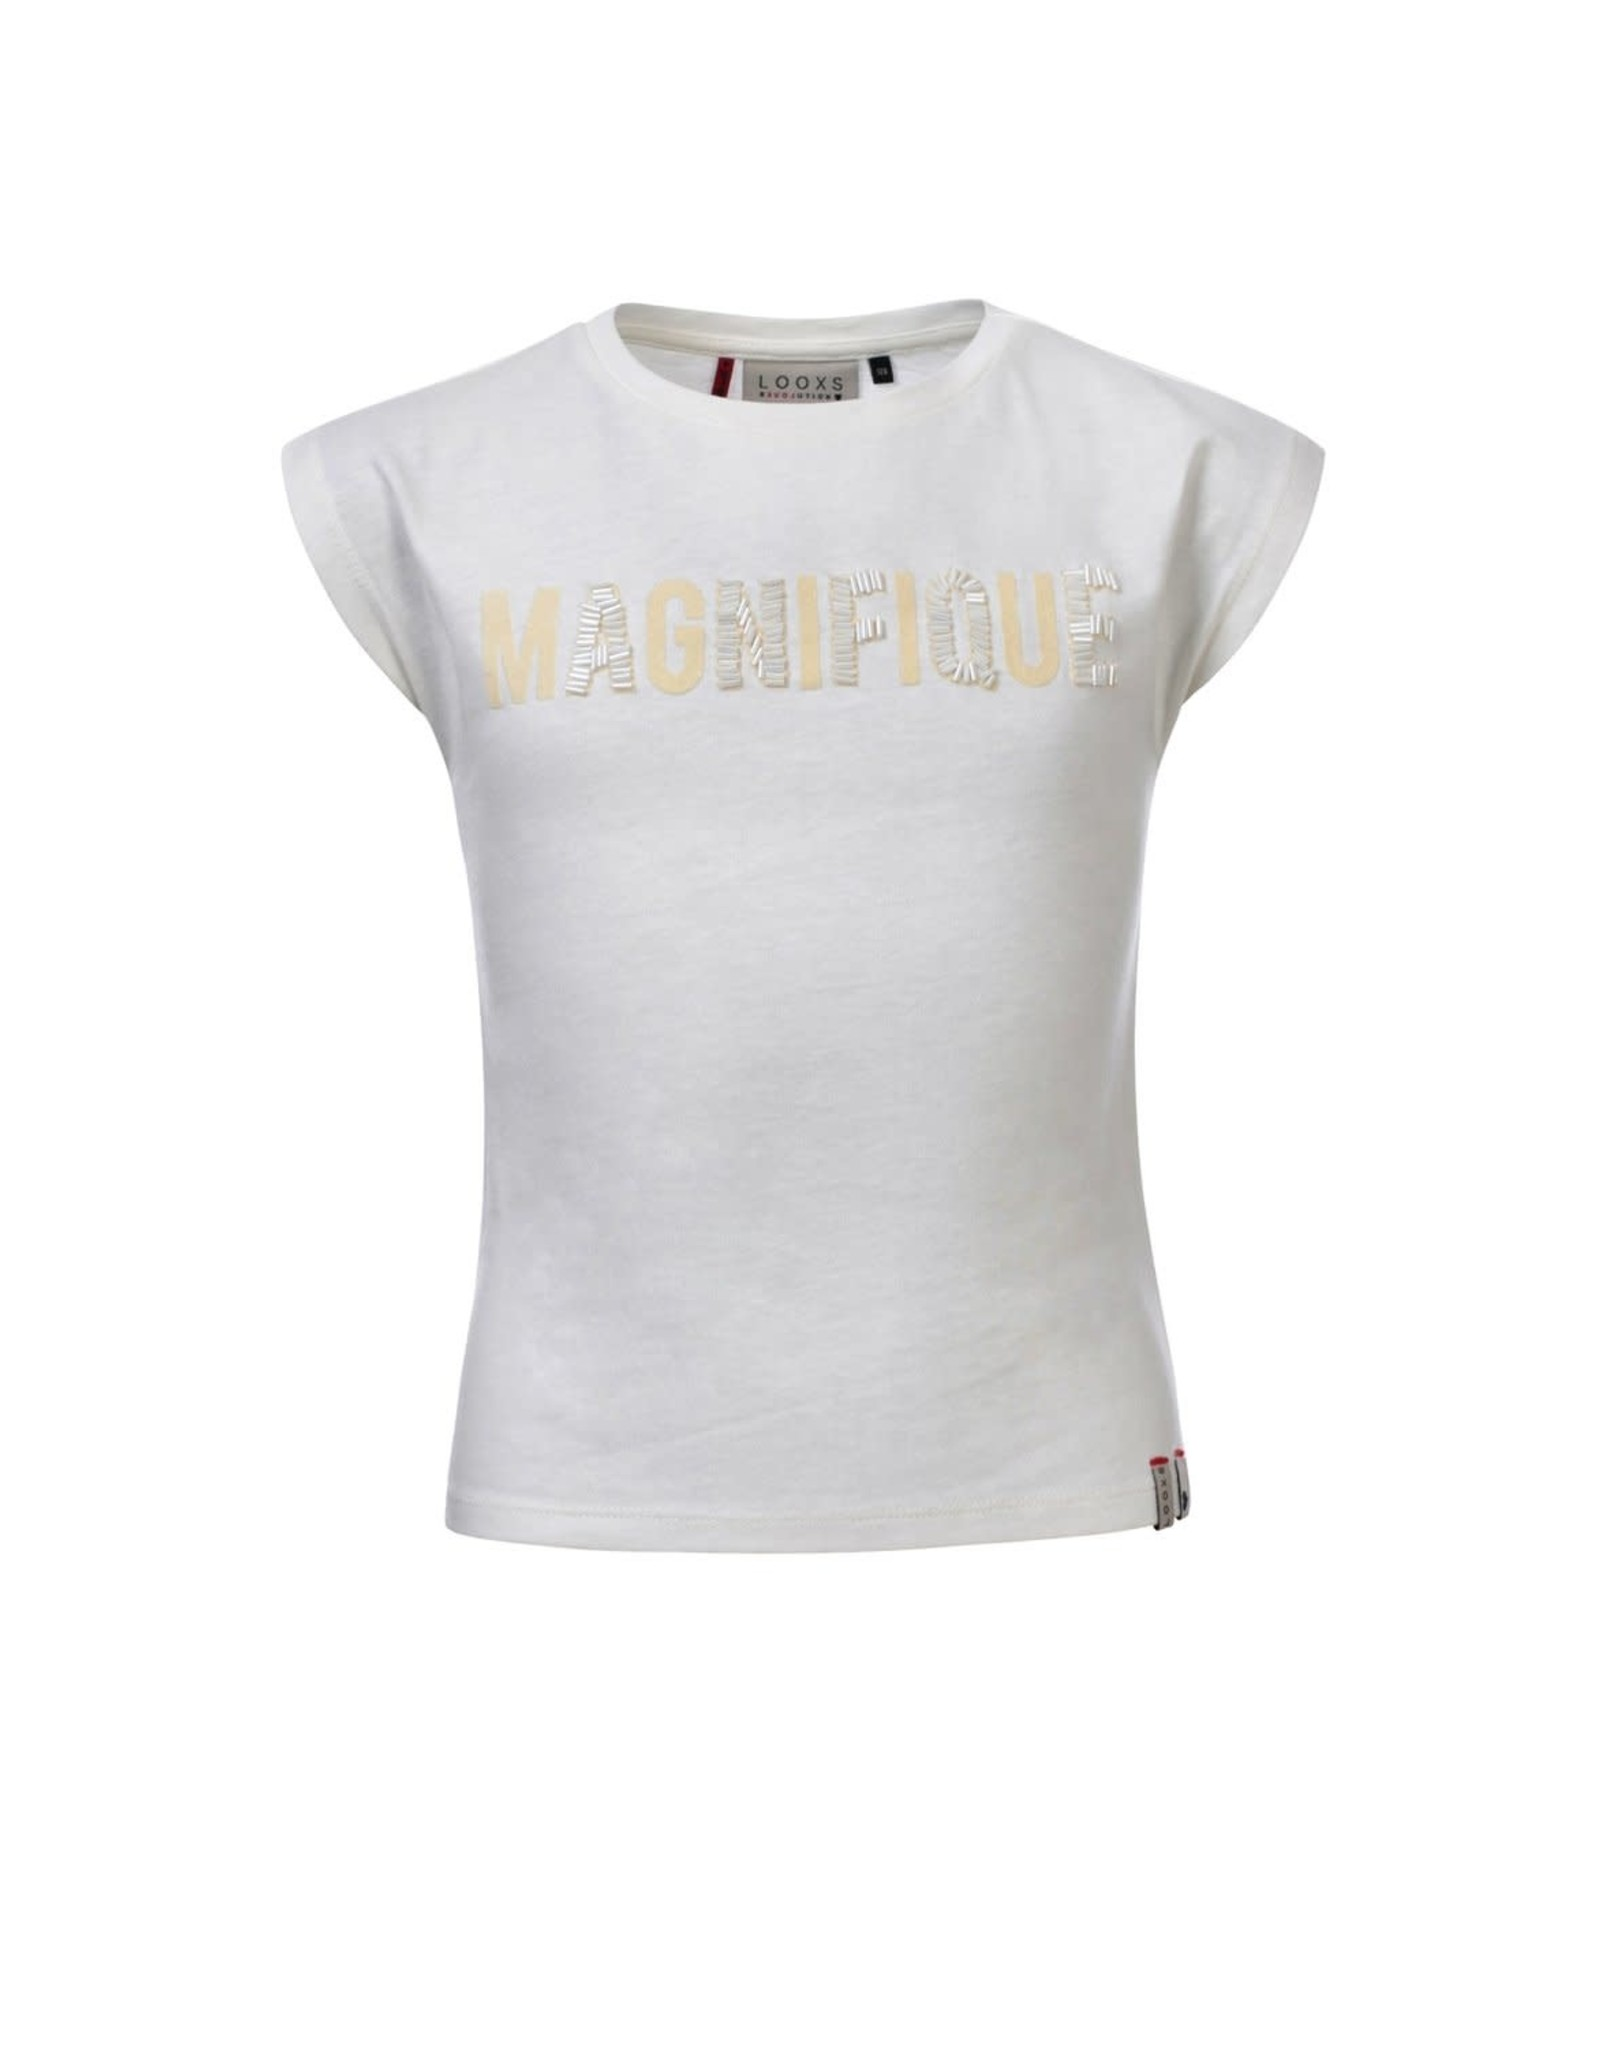 Looxs Girls T-shirt s/s off white